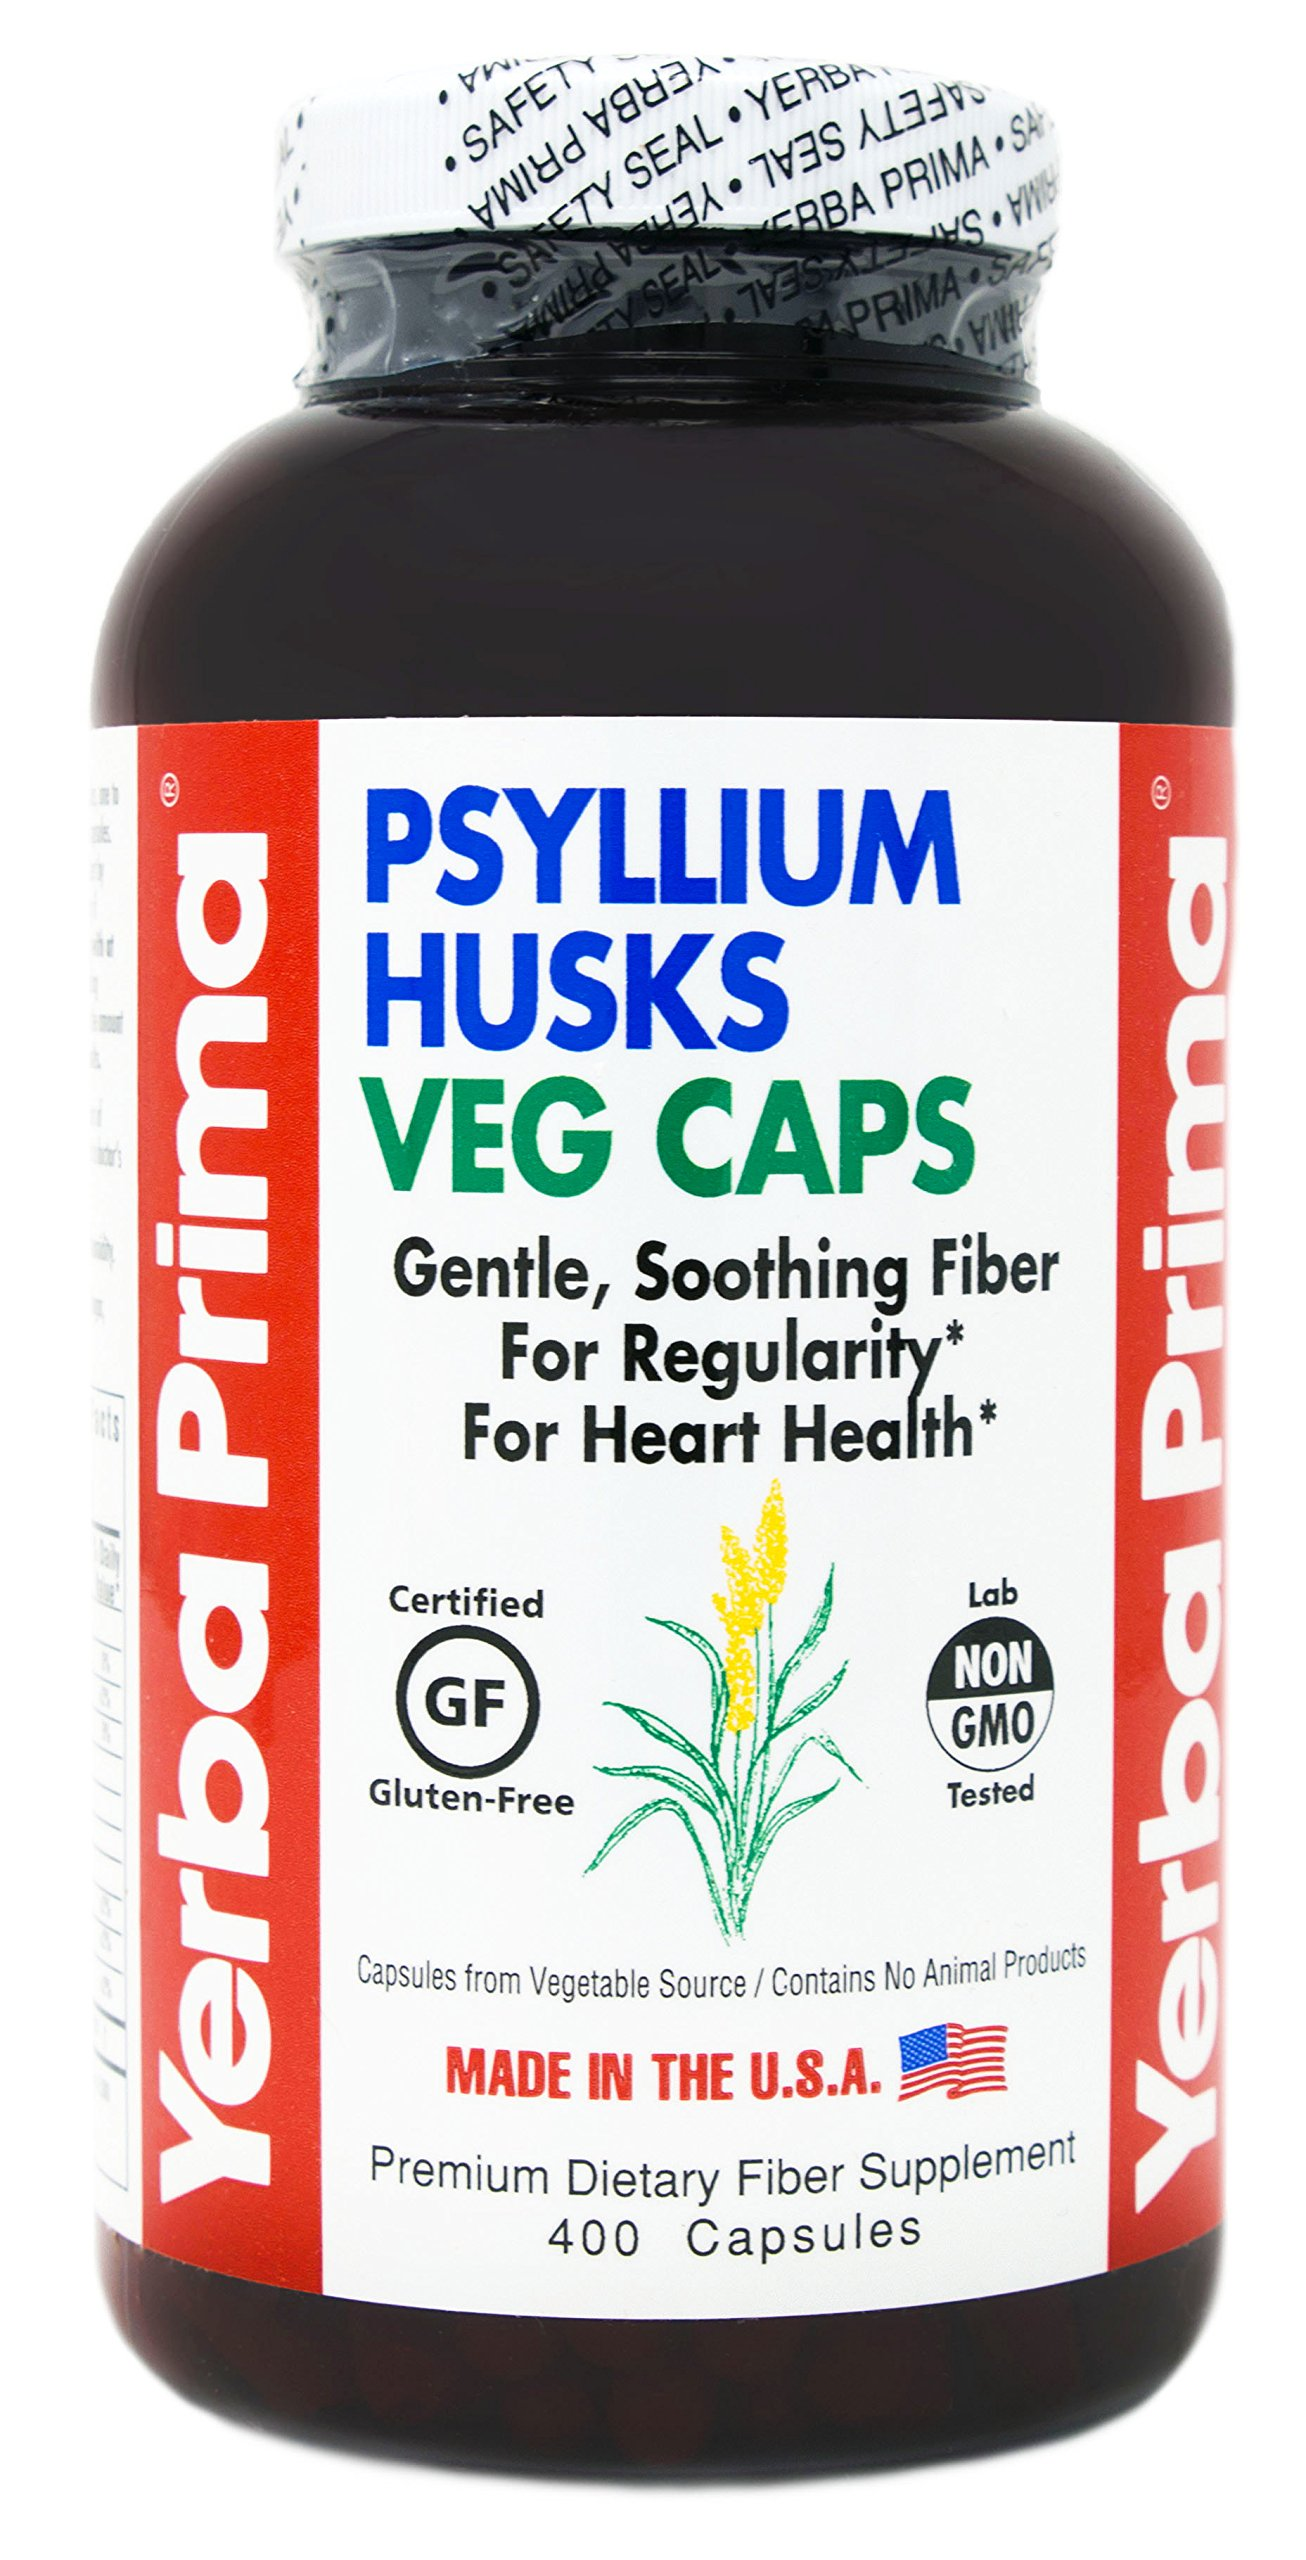 Yerba Prima Psyllium Husks Veg Caps - 400 Count (625mg per capsule) - Non-GMO, Gluten Free, Daily Fiber Supplement